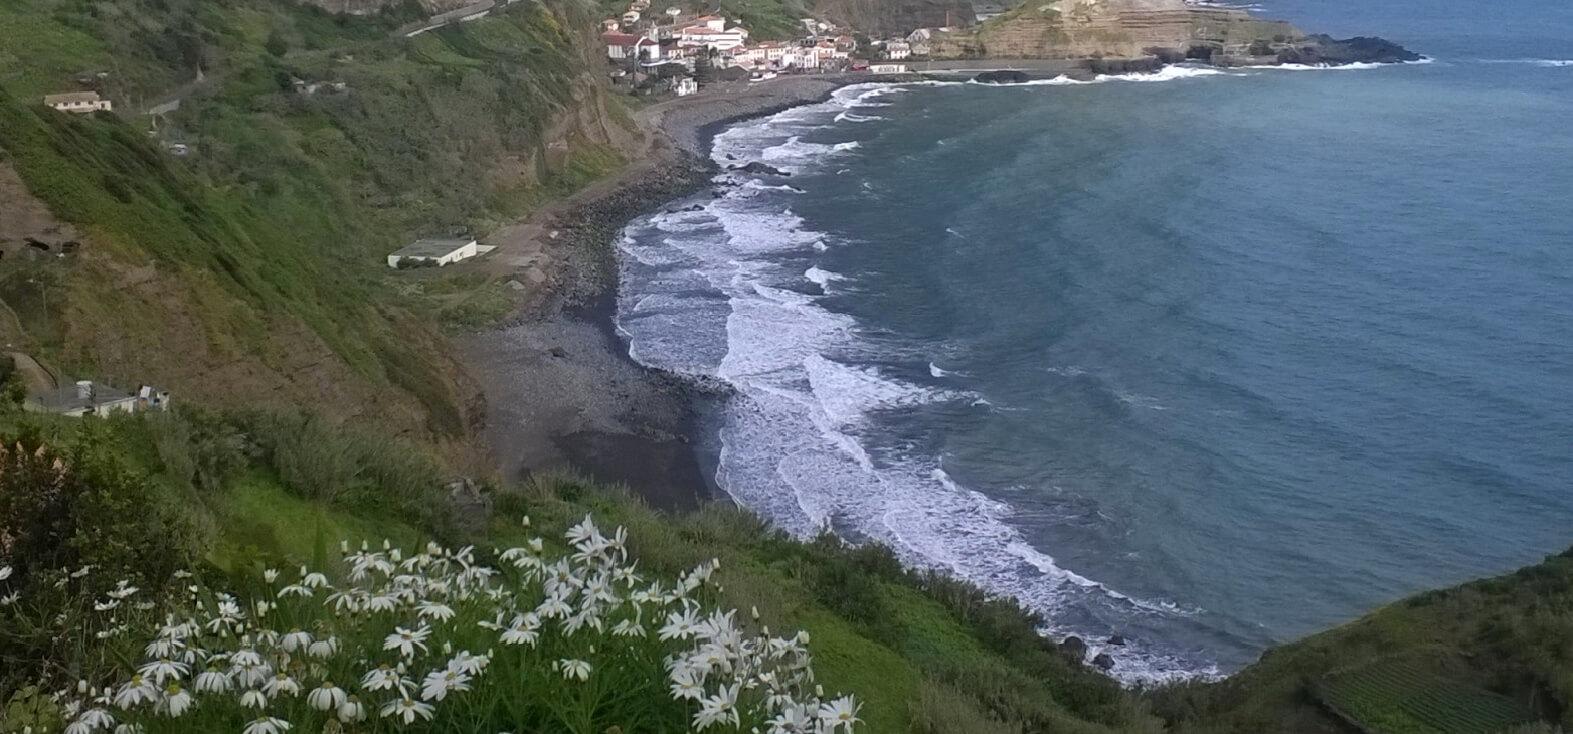 Surfcamp Surfinn Porto da Cruz Surf Camp & School  in Porto da Cruz, Madeira, Portugal